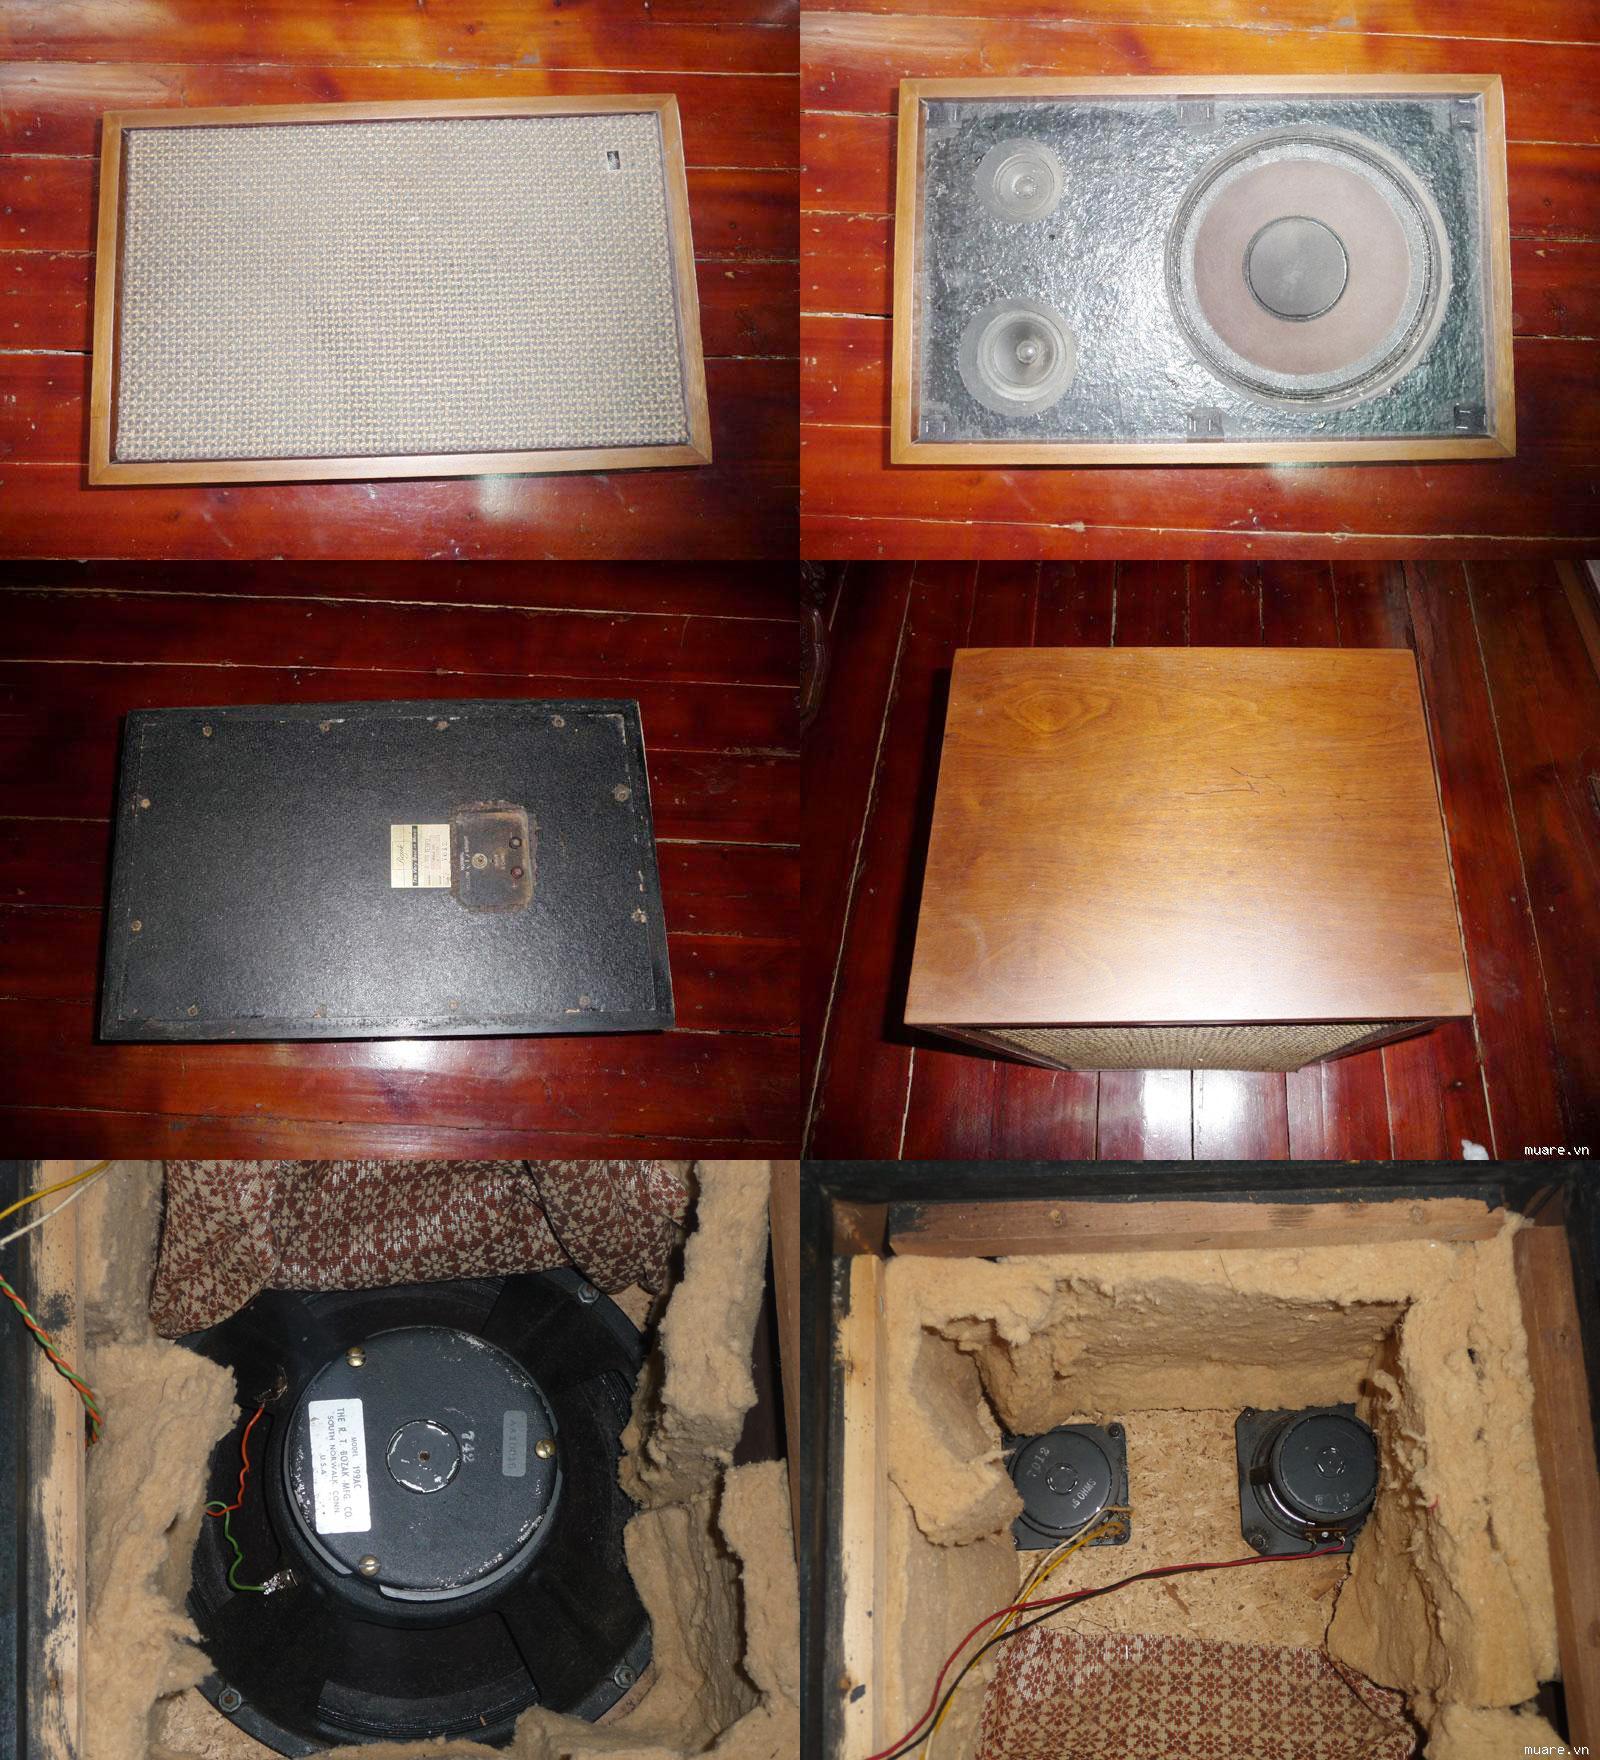 Bán Loa Bozak, Fisher, Ampli .. ..Đâù Cd Sony 750, 222Es, Pionner 7050, Denon